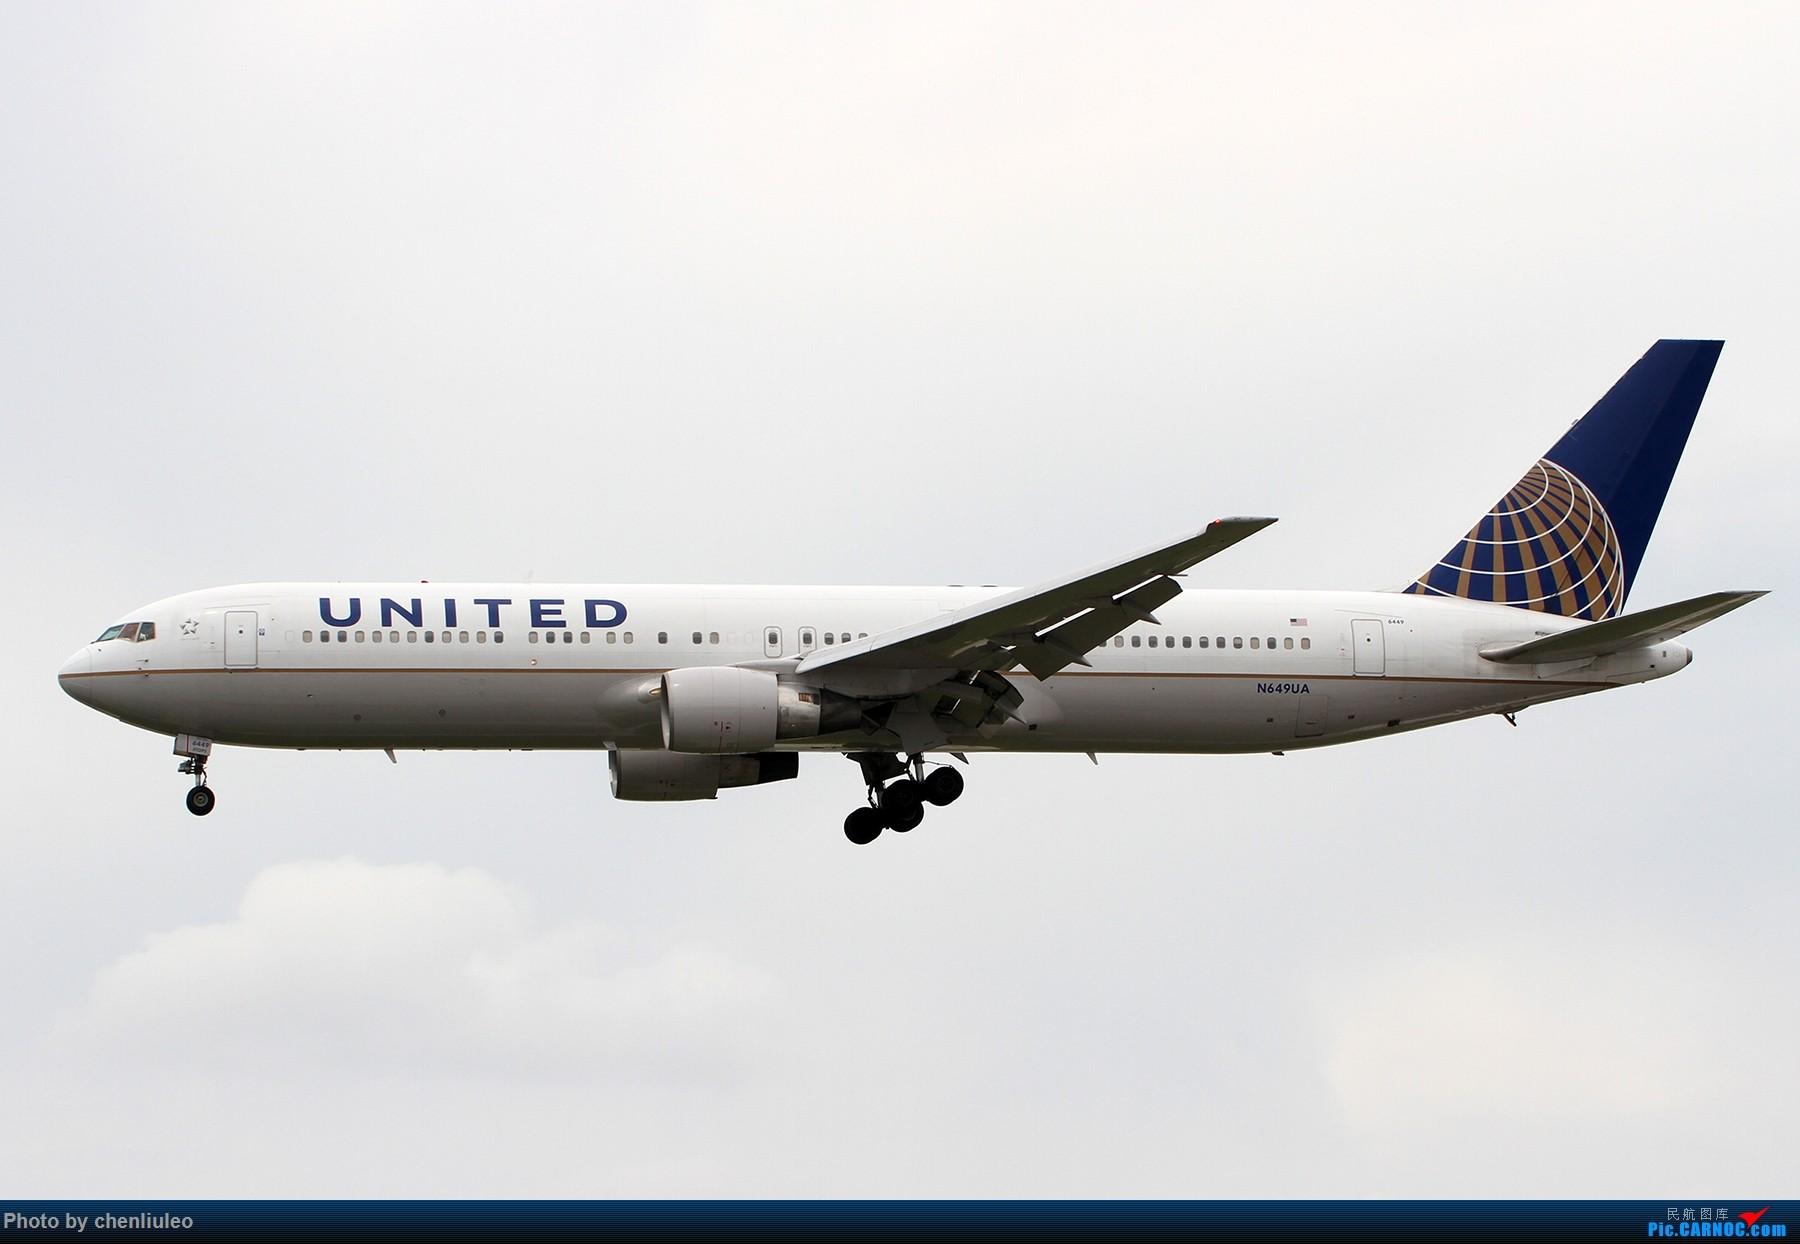 Re:[原创]【北美飞友会】芝加哥奥黑尔机场首拍 BOEING 767-300ER N649UA 美国芝加哥奥黑尔国际机场